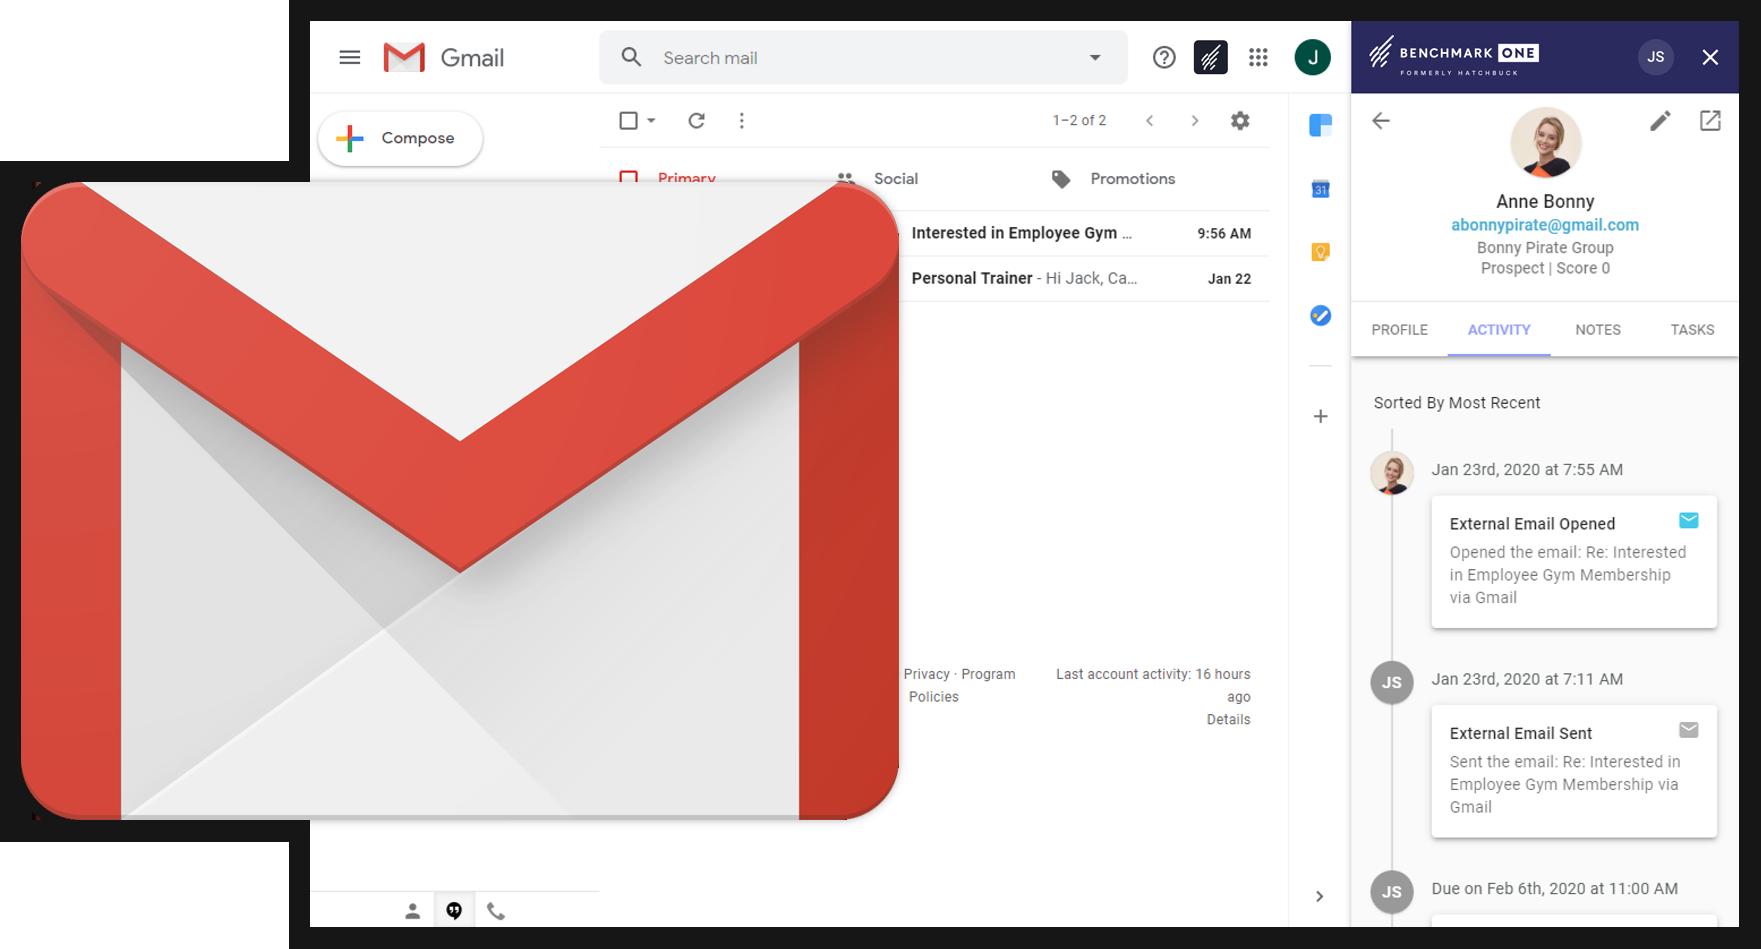 gmail-integration-bmo